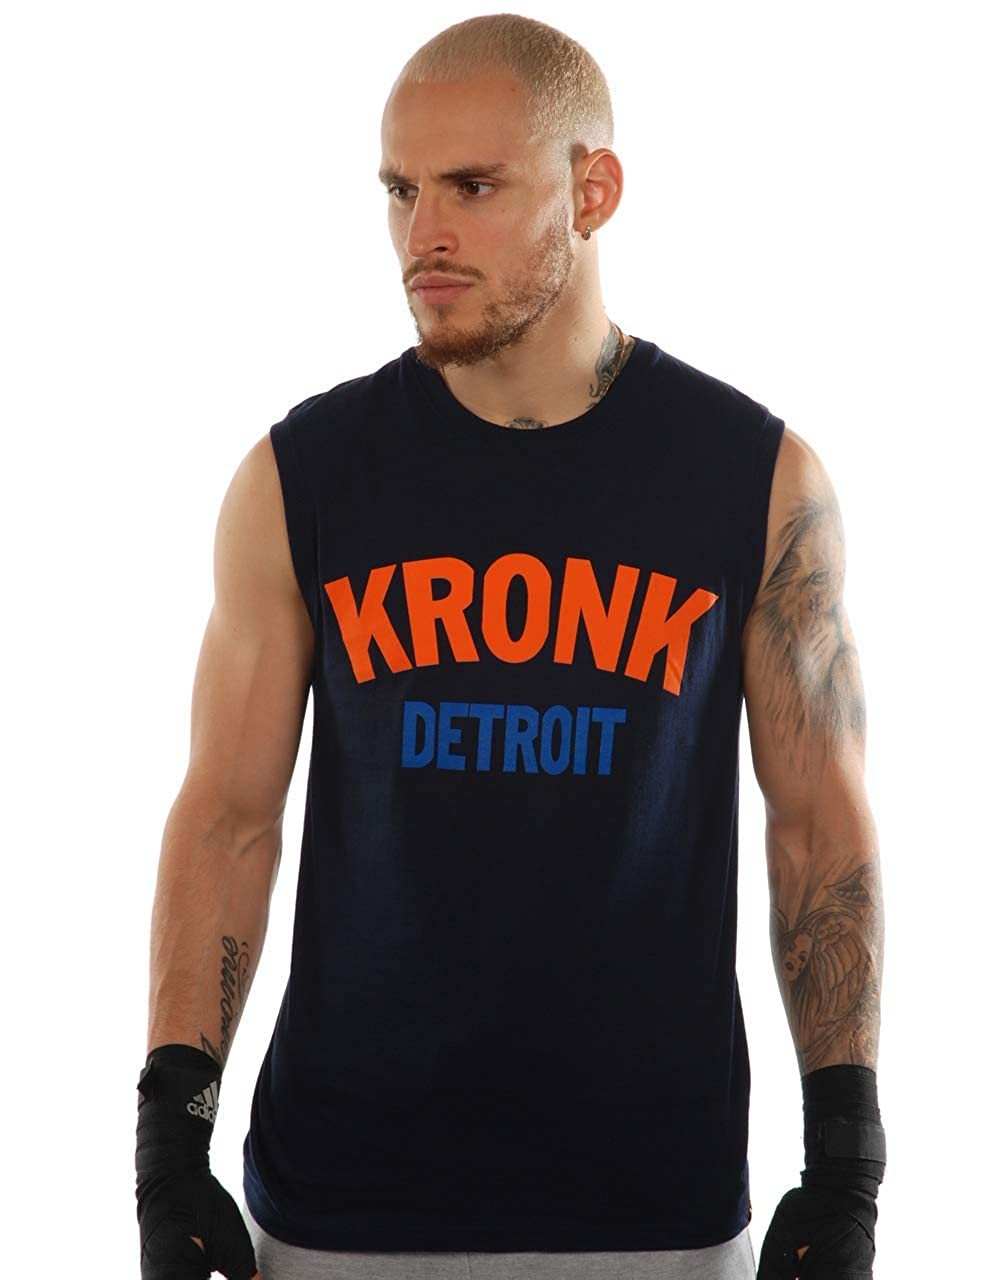 Kronk Two Colour Detroit Sleeveless T Shirt